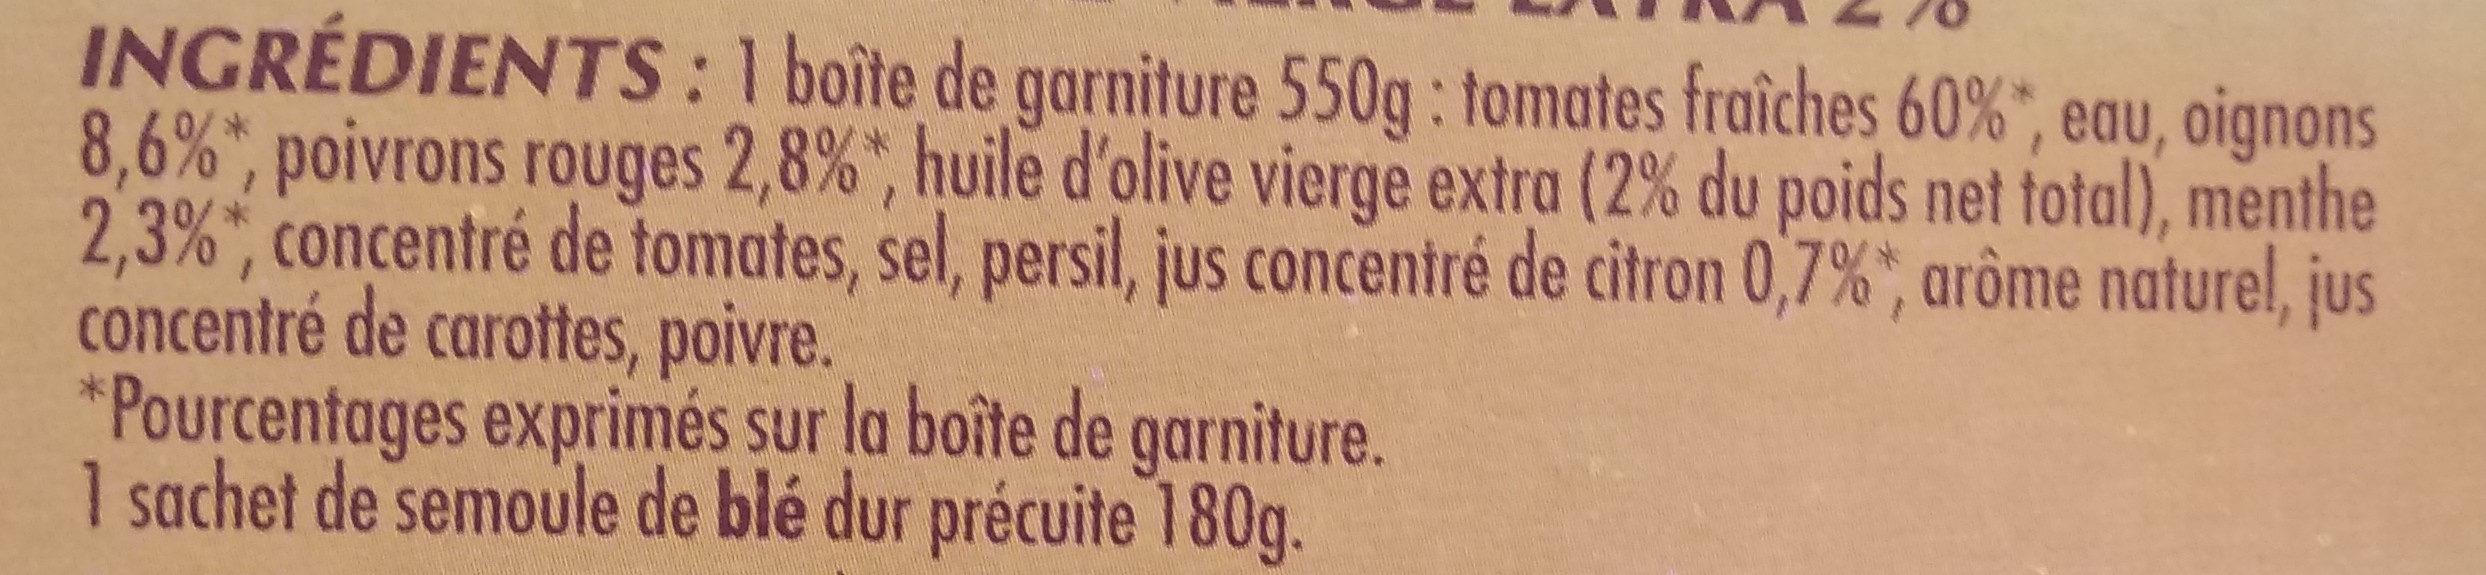 Taboulé menthe & huile d'olive - Ingredients - fr